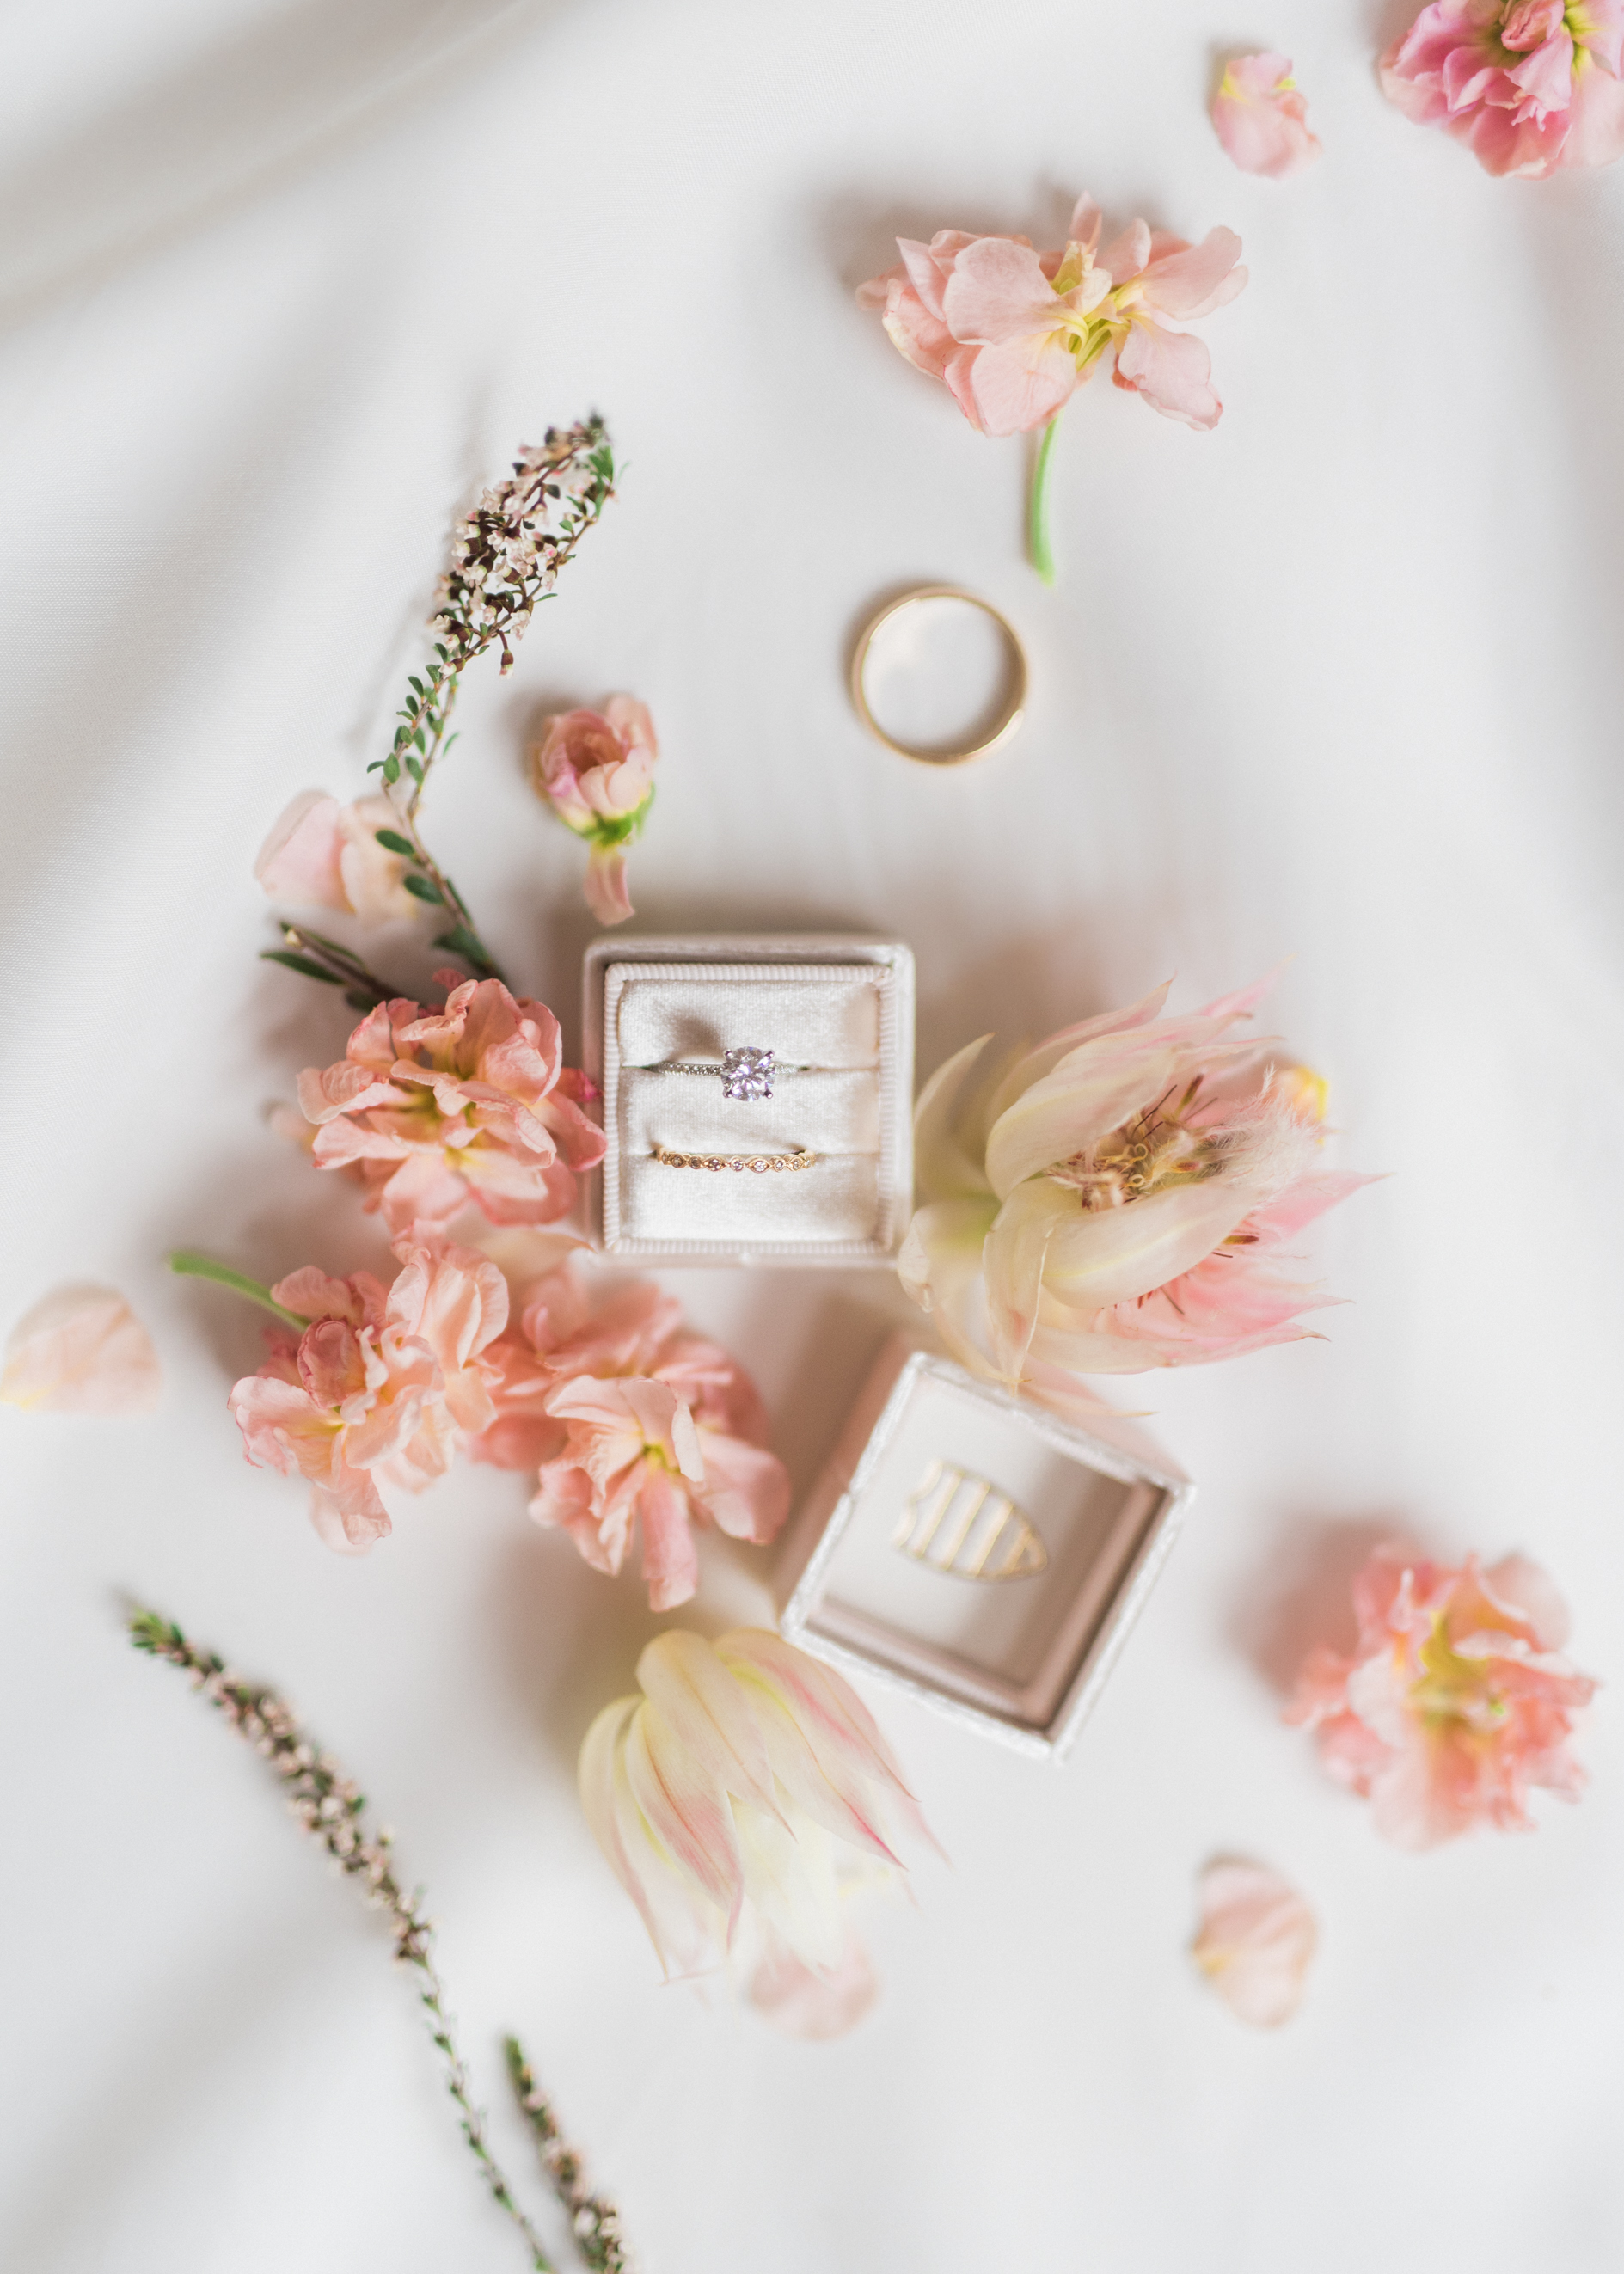 Flowers by Lace + Lilies, wedding flowers, estes park wedding, blush and burgundy, foliage, greenery, bridal bouquet, mountain wedding, wedding photography